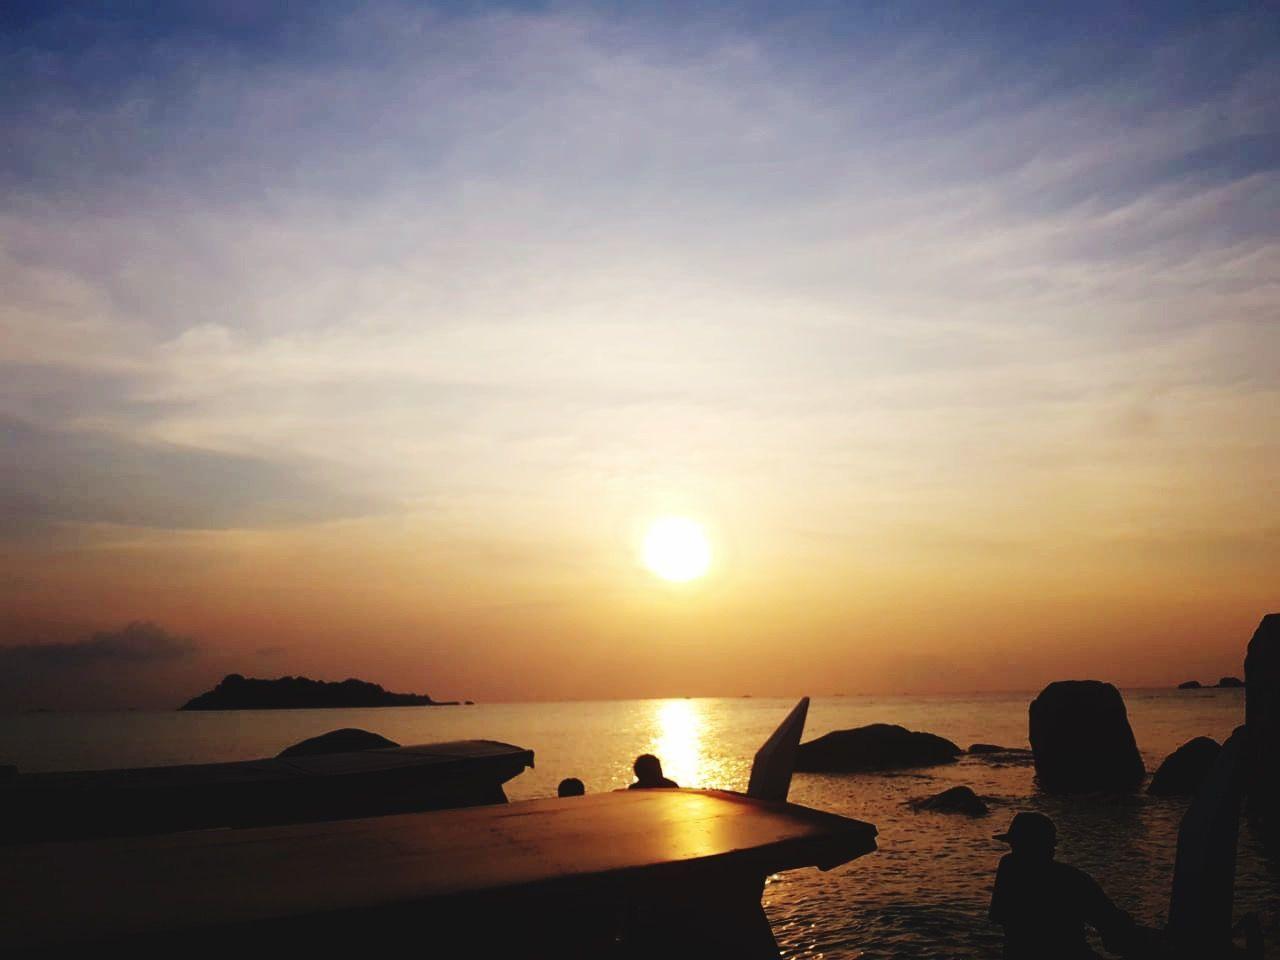 water, sky, sea, scenics - nature, sunset, beauty in nature, sun, tranquil scene, tranquility, silhouette, nature, idyllic, rock, sunlight, land, beach, orange color, horizon, horizon over water, no people, outdoors, bright